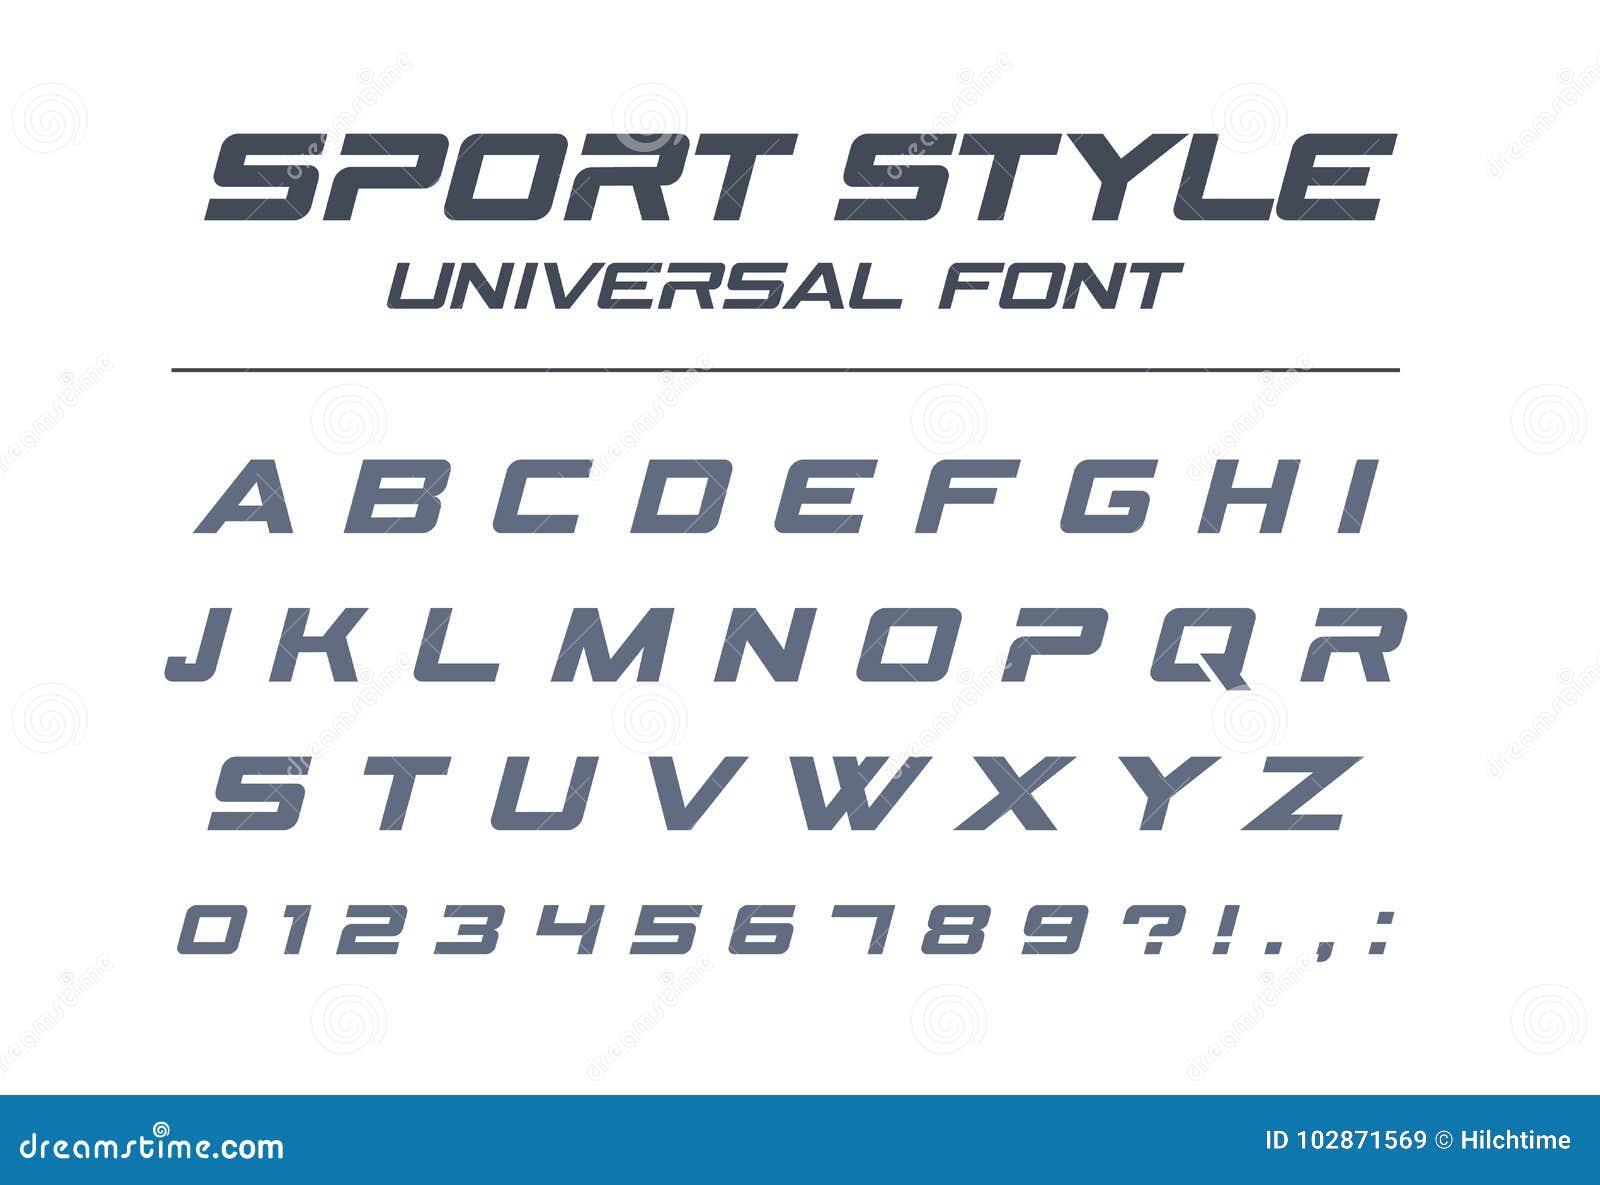 Fonte do universal do estilo do esporte Velocidade rápida, futurista, tecnologia, alfabeto futuro